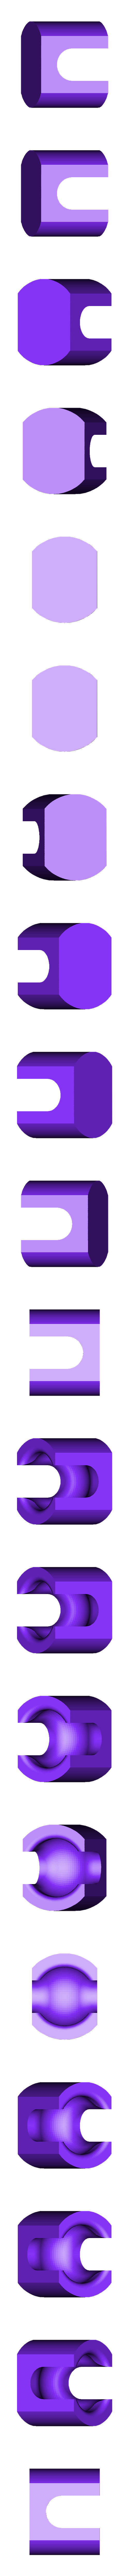 test_piece_socket.stl Download free STL file Joystick PS4 • 3D print object, Osichan